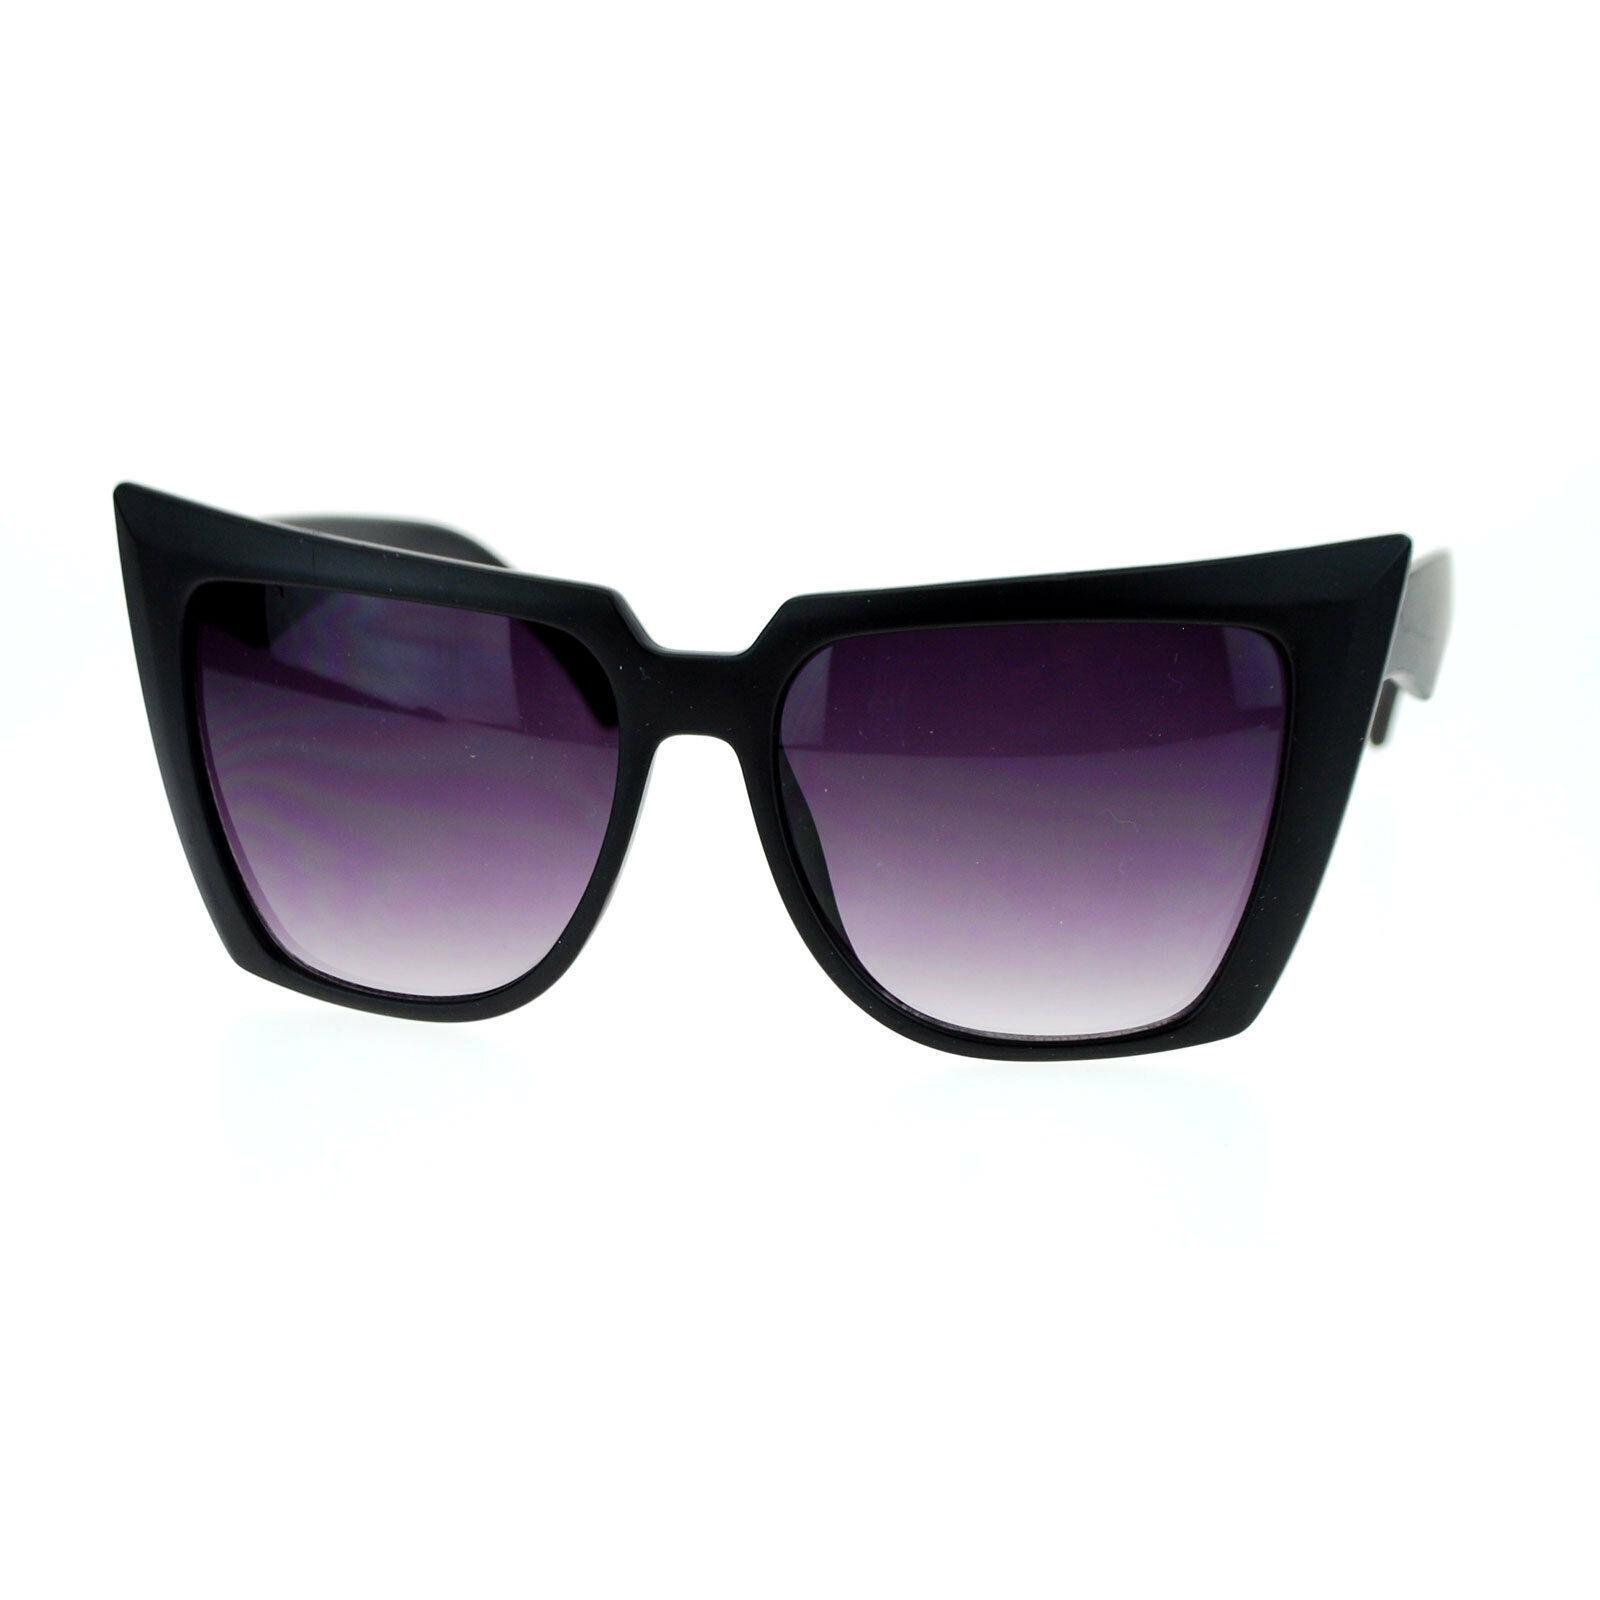 Womens Super Oversized Square Cateye Sunglasses Fierce Runway Fashion